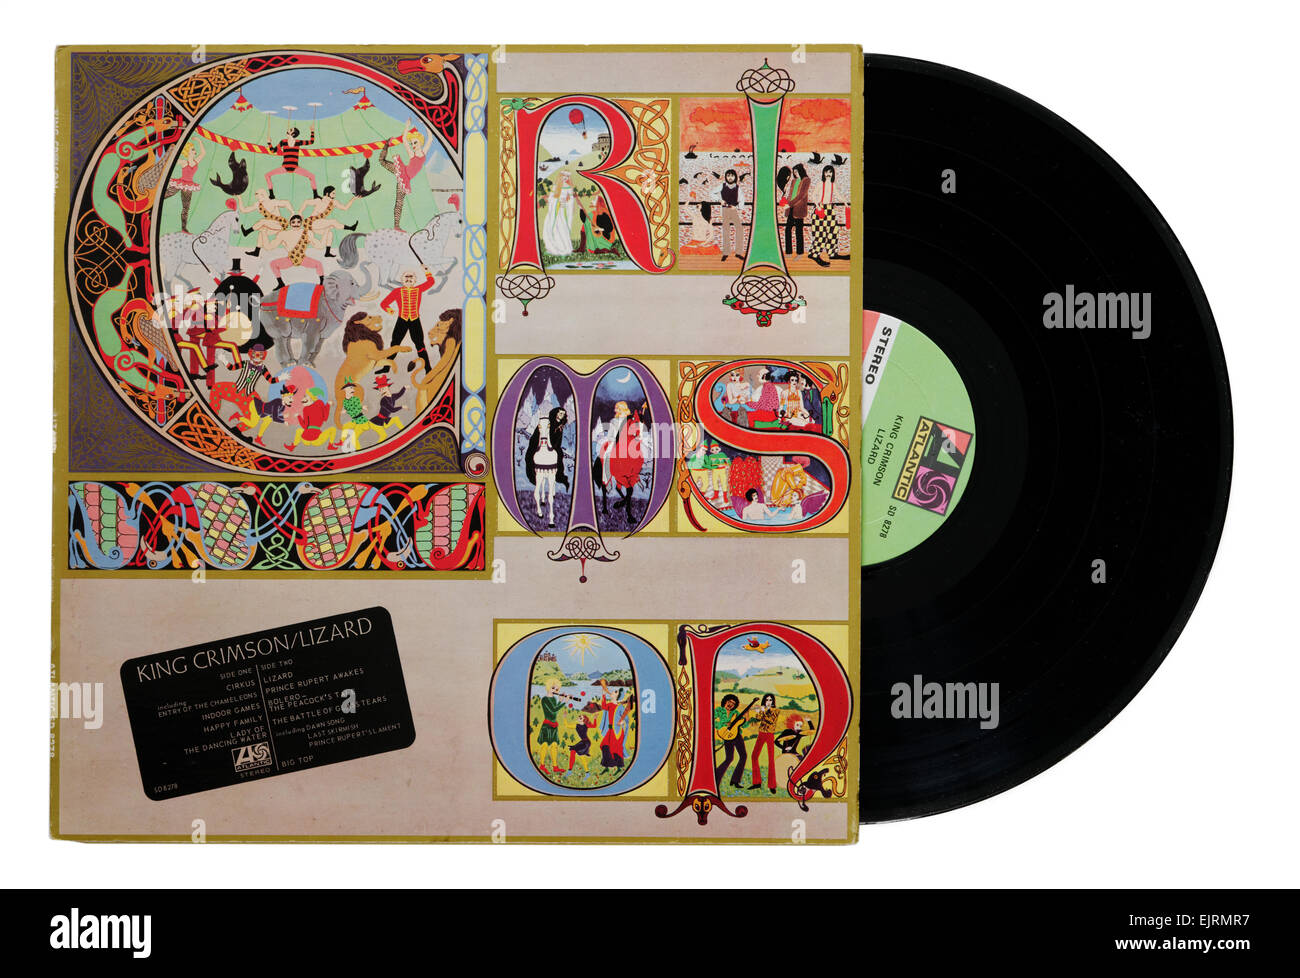 King Crimson album Lizard - Stock Image